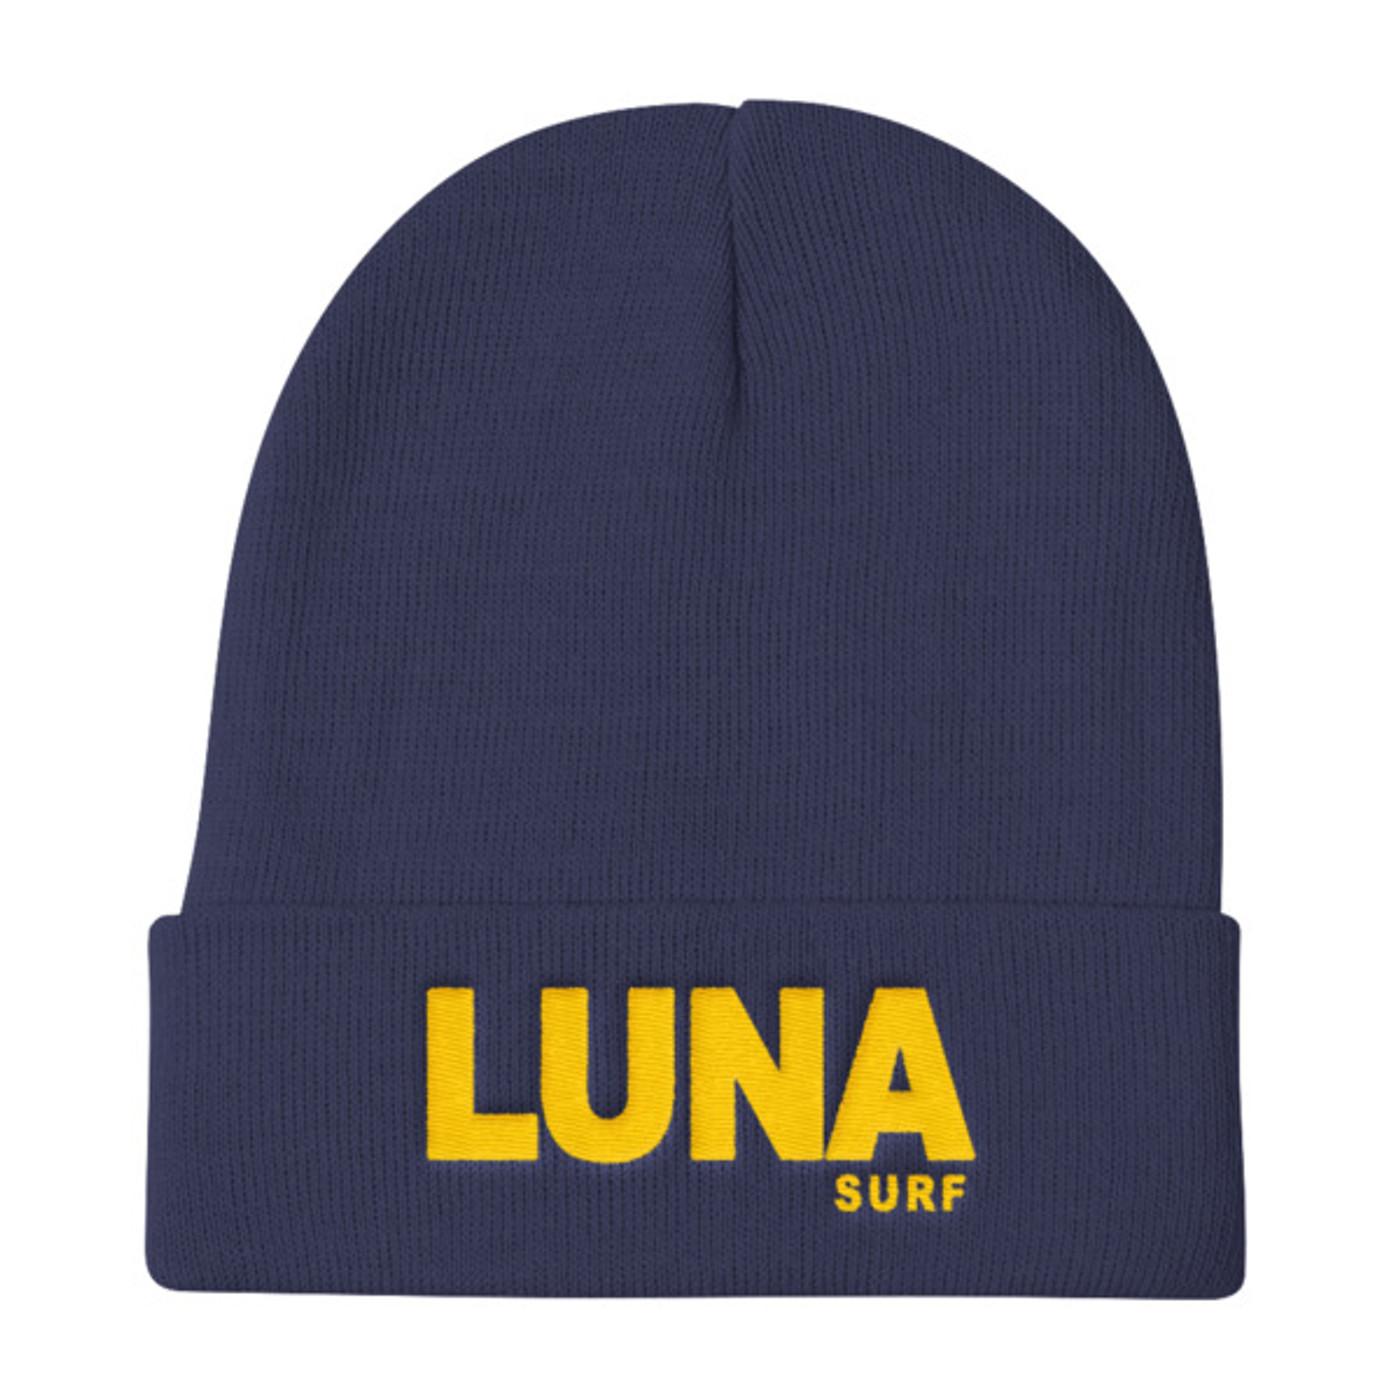 Luna text logo Gold Knit Beanie